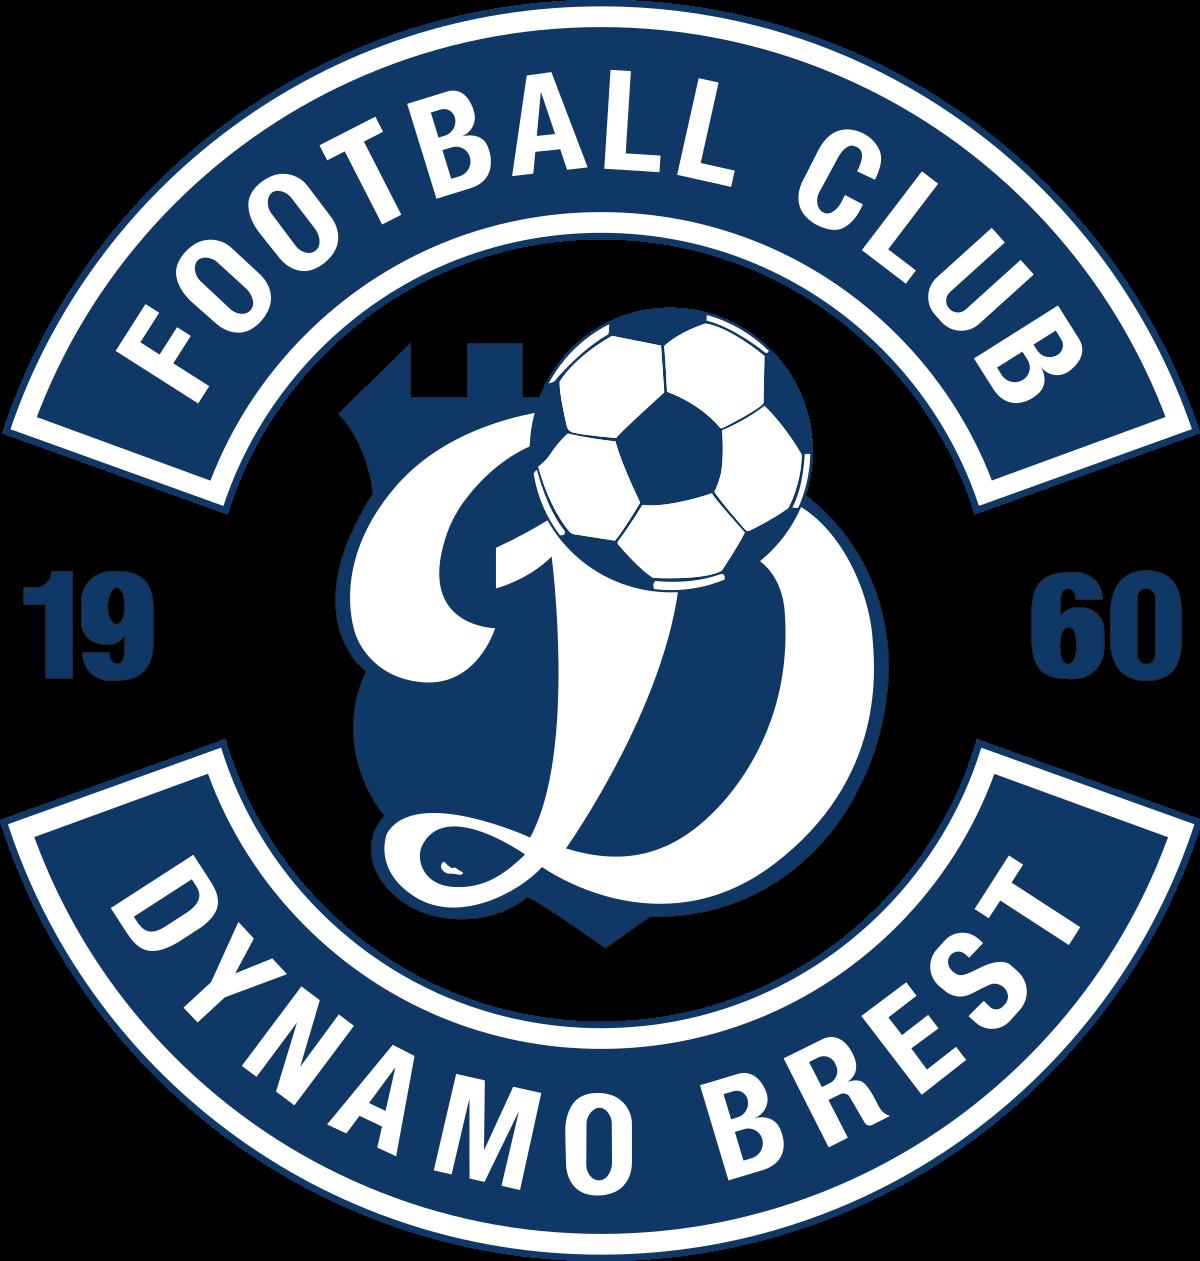 Dinamo Brest-2 logo